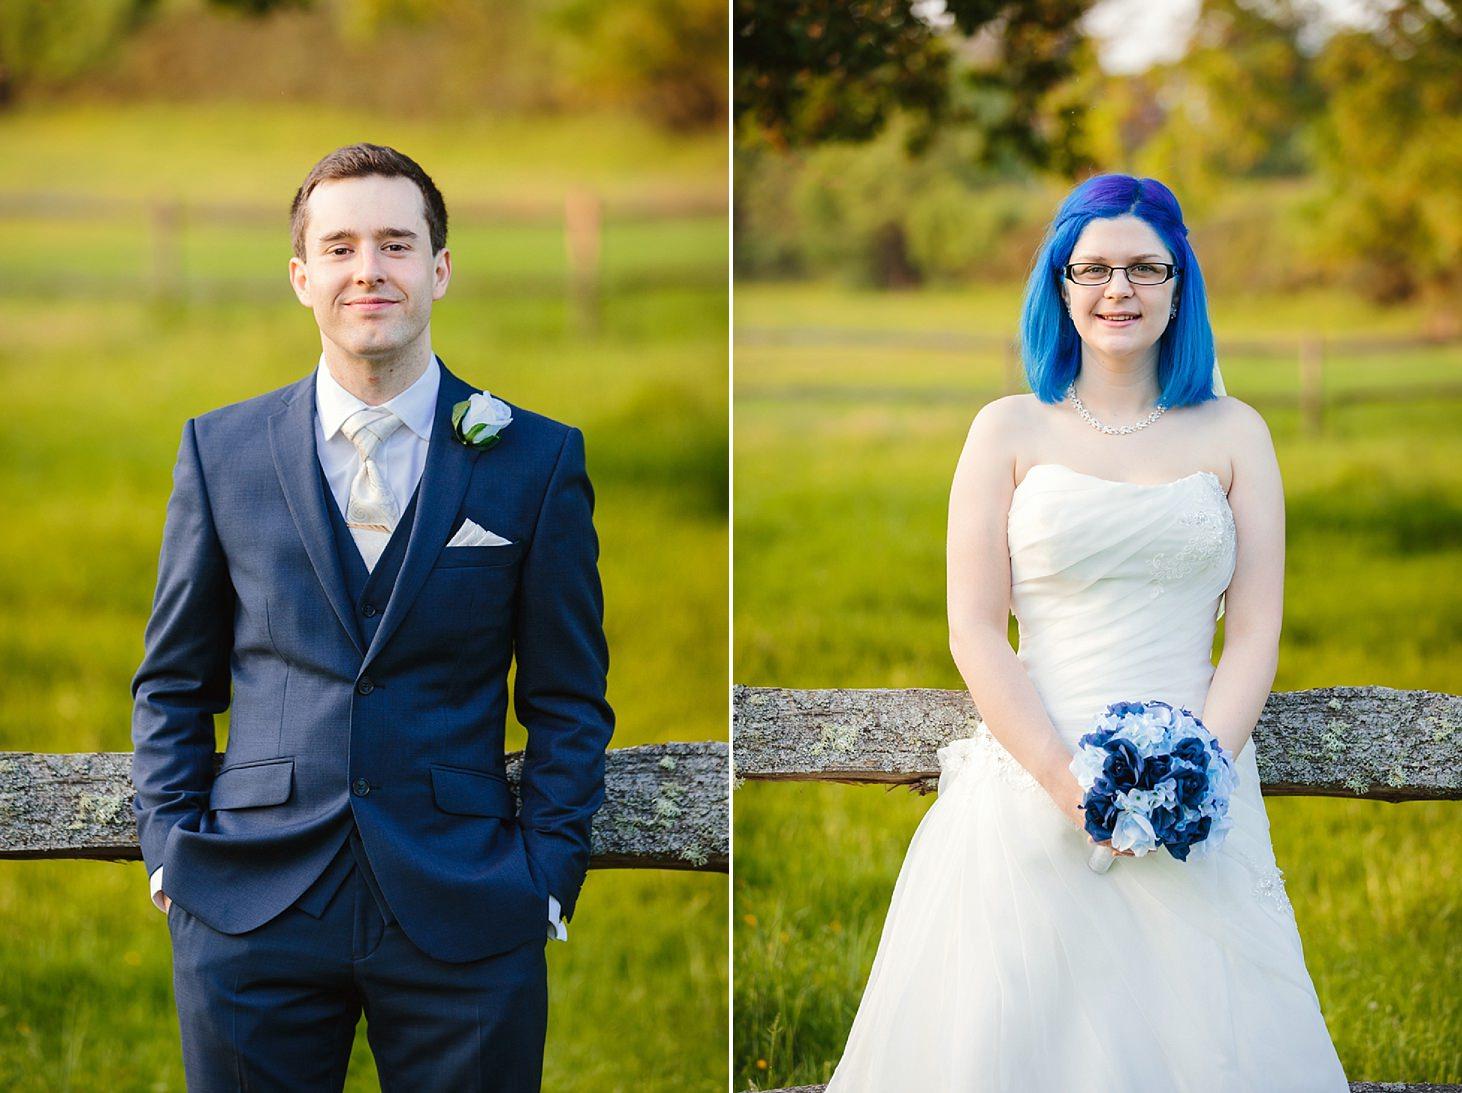 gate street barn wedding photography bride and groom single portrait